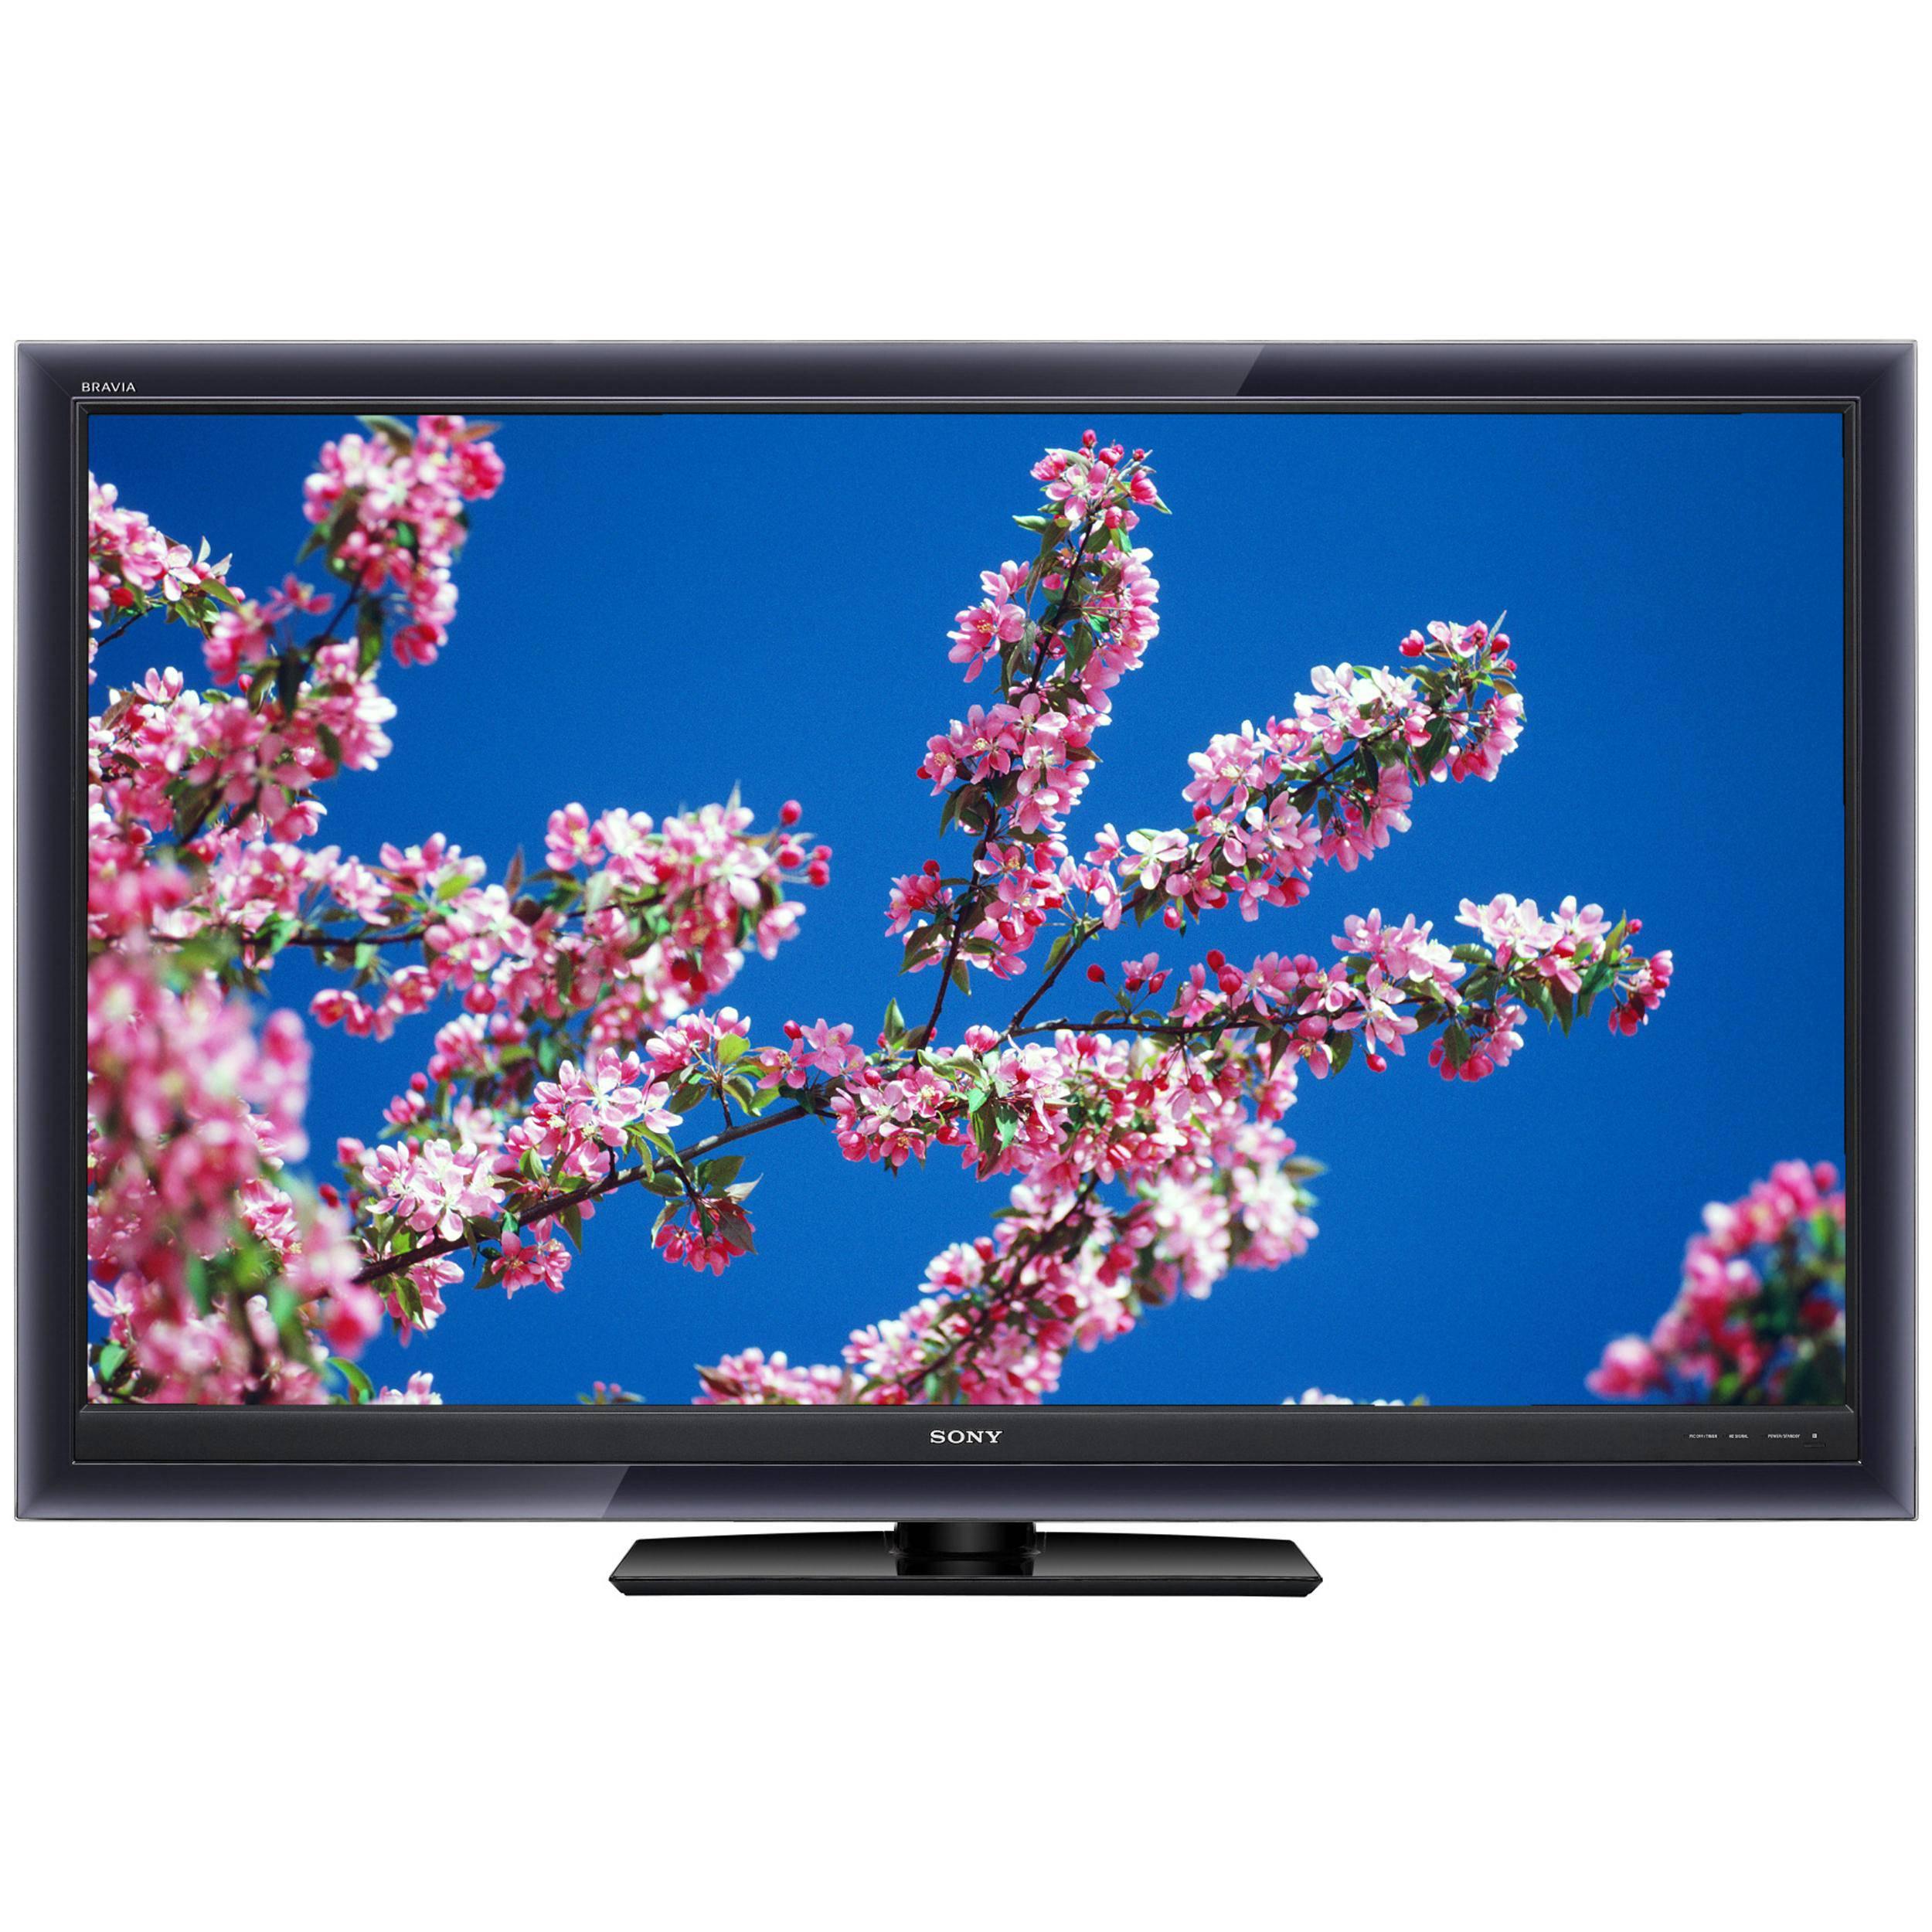 Sony KDL-32EX728 BRAVIA HDTV Drivers Windows